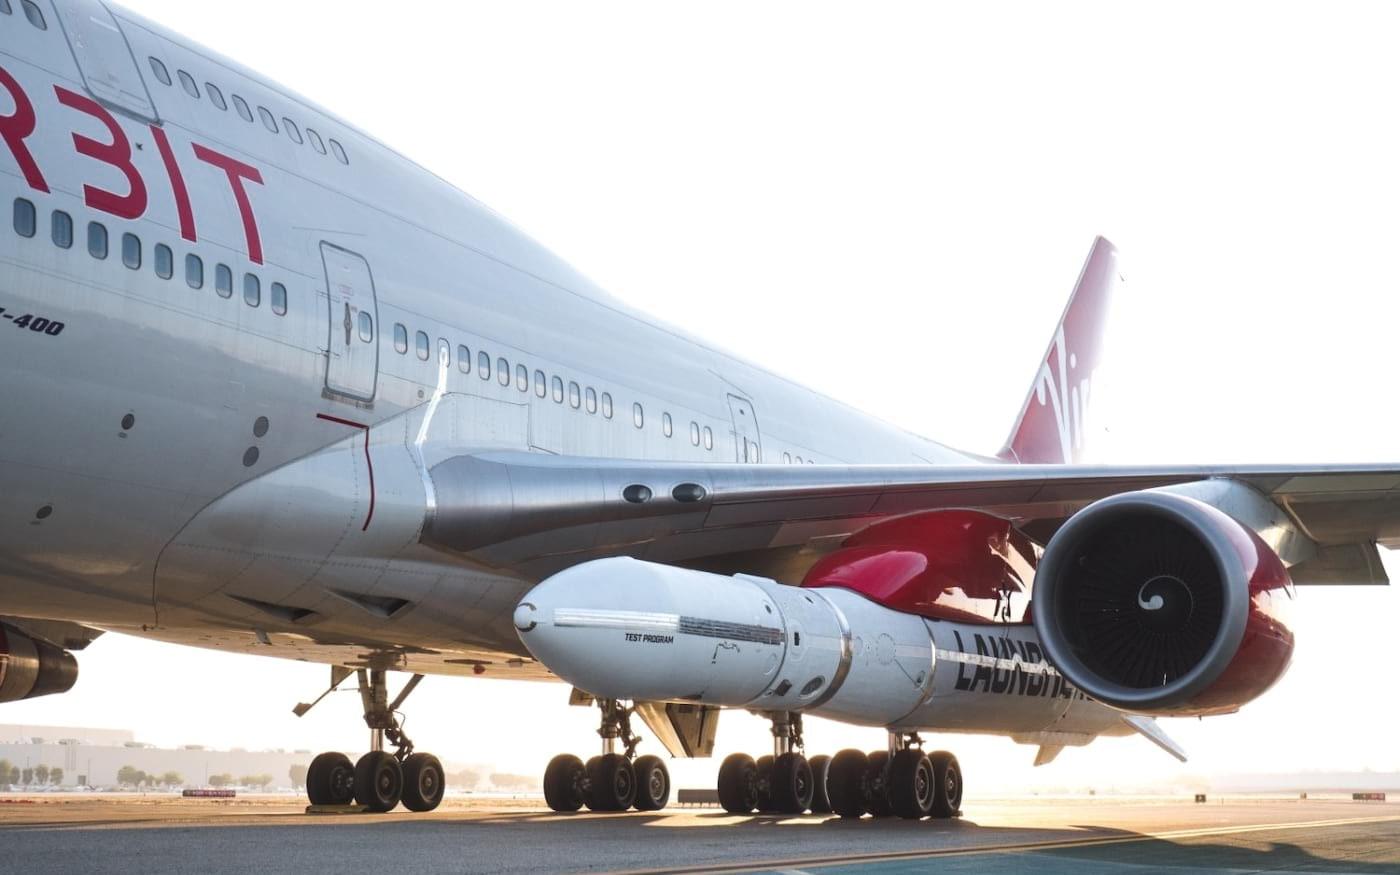 Boeing 747 da Virgin Orbit lança foguete sobre a Califórnia durante teste de voo crucial